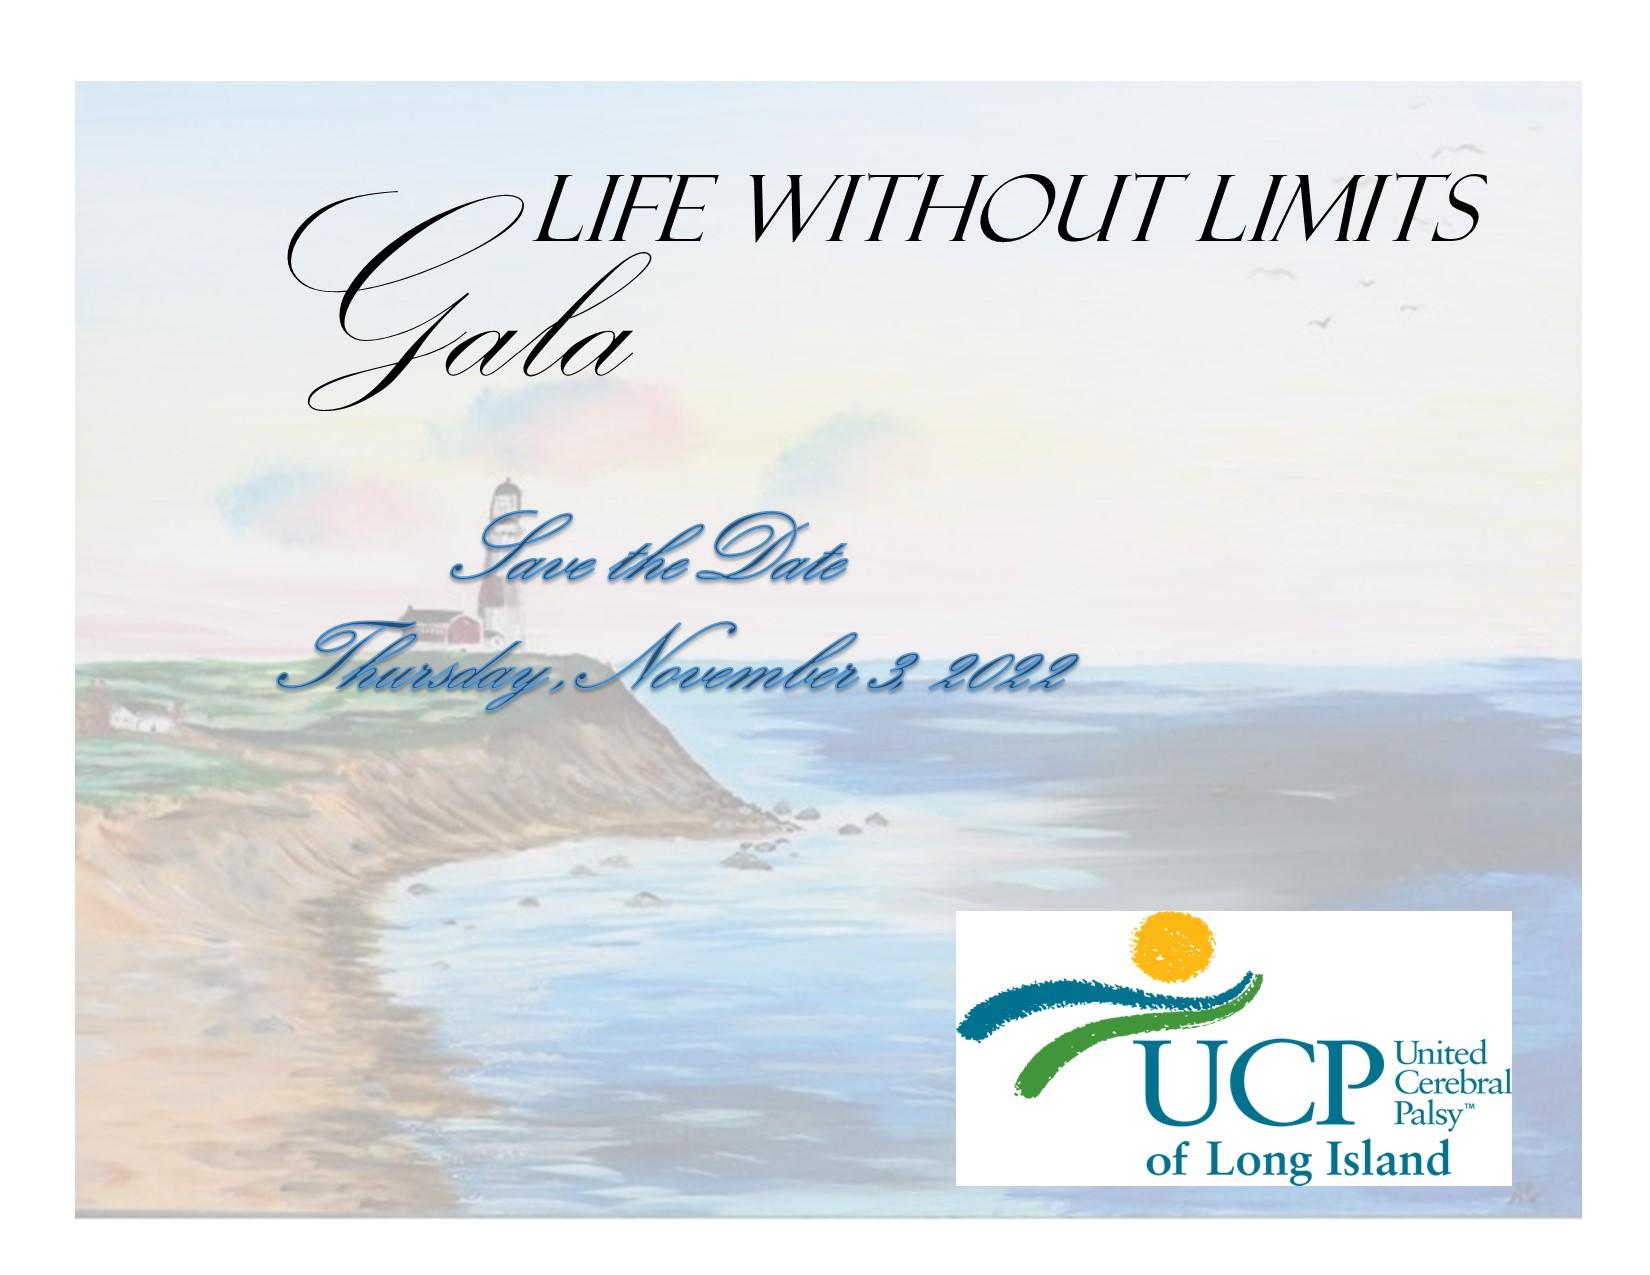 Life Without Limits Gala